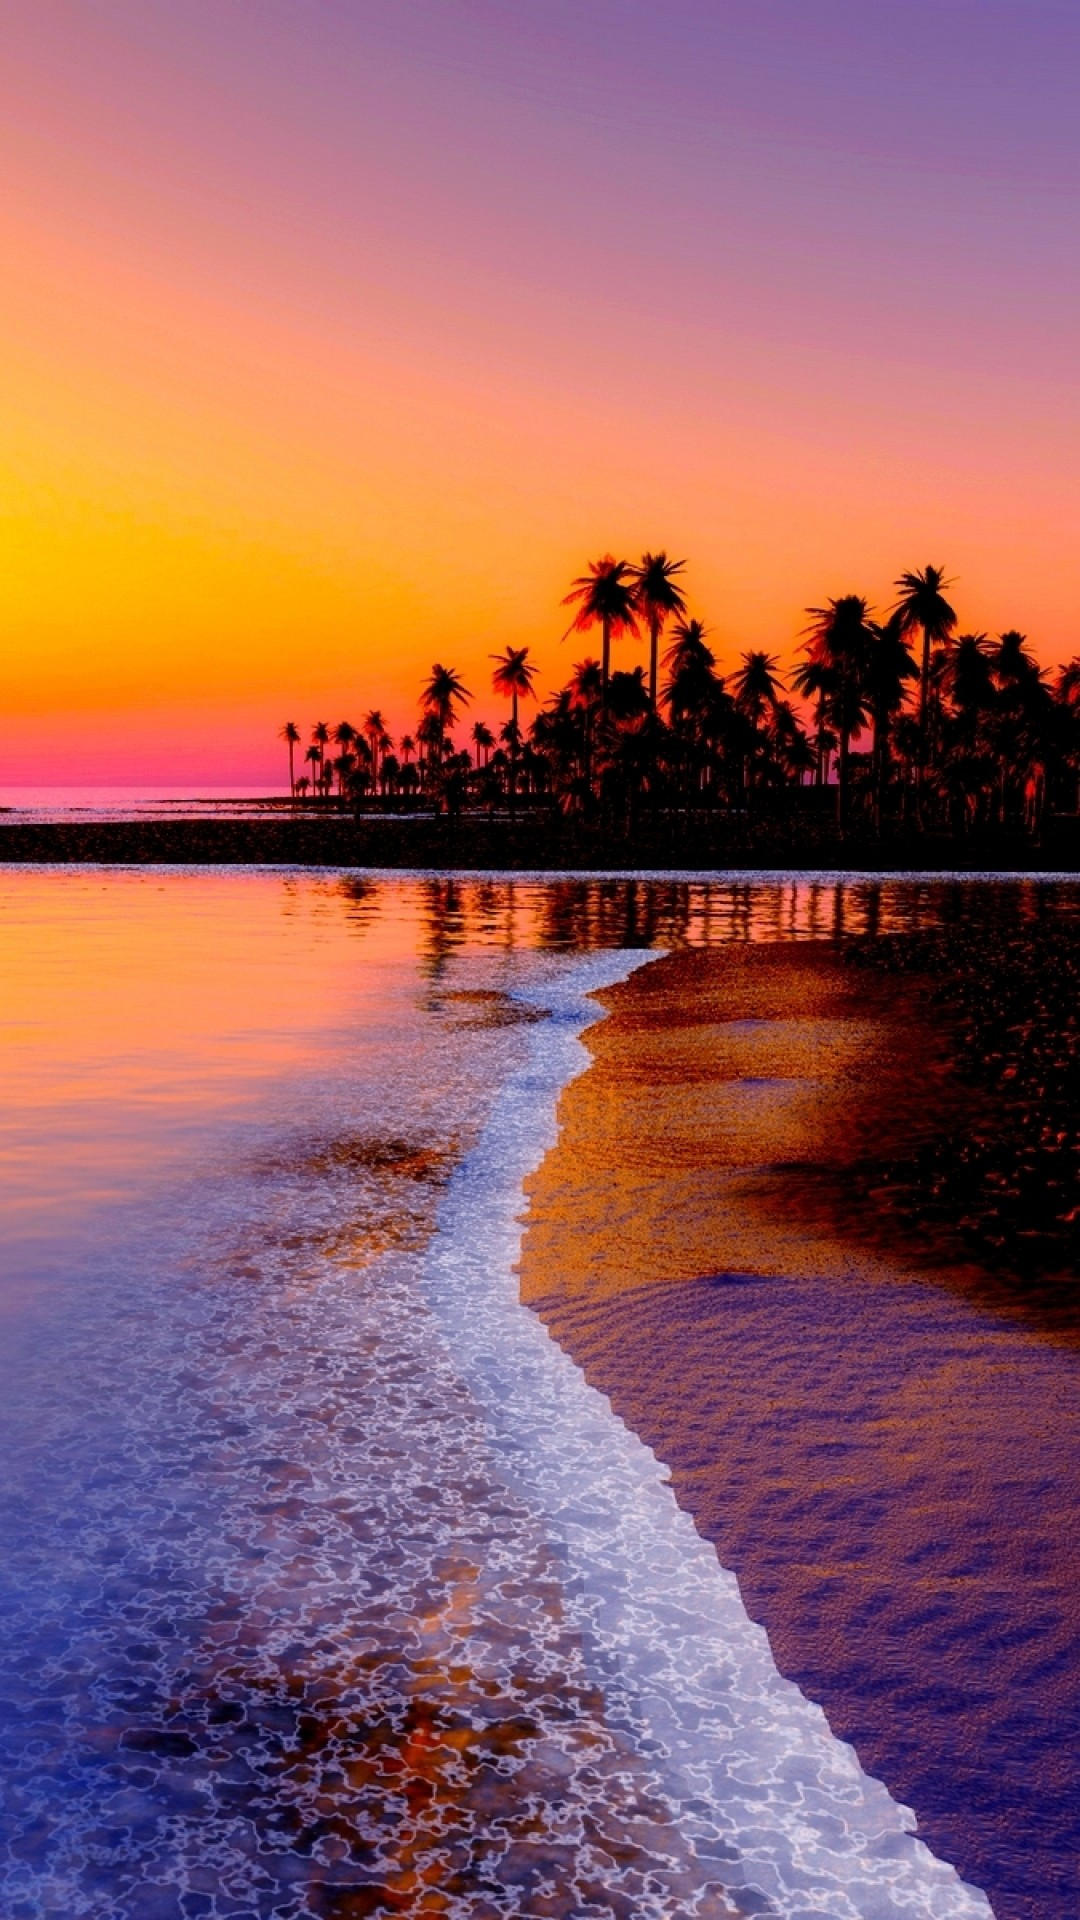 Preview wallpaper beach, tropics, sea, sand, palm trees, sunset 1080×1920